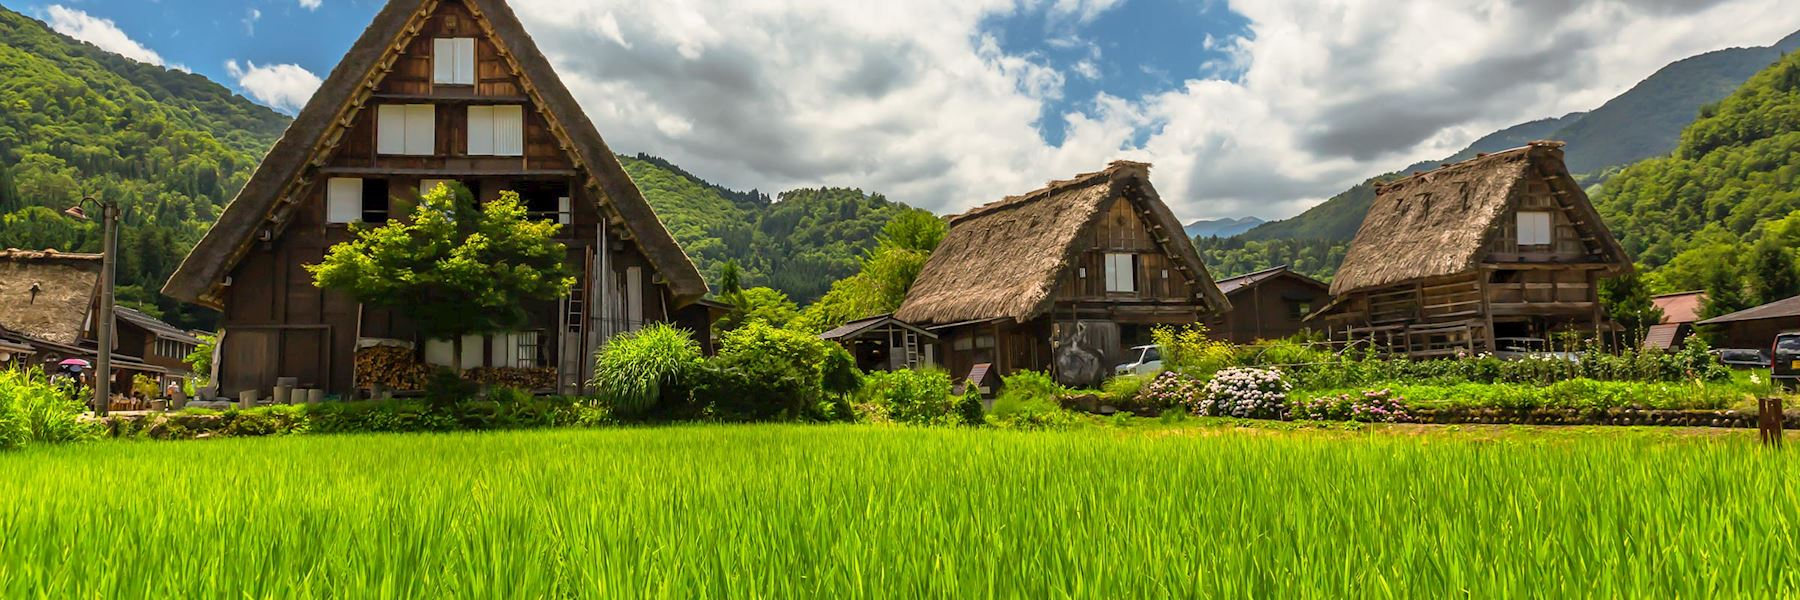 Visit Shirakawago, Japan